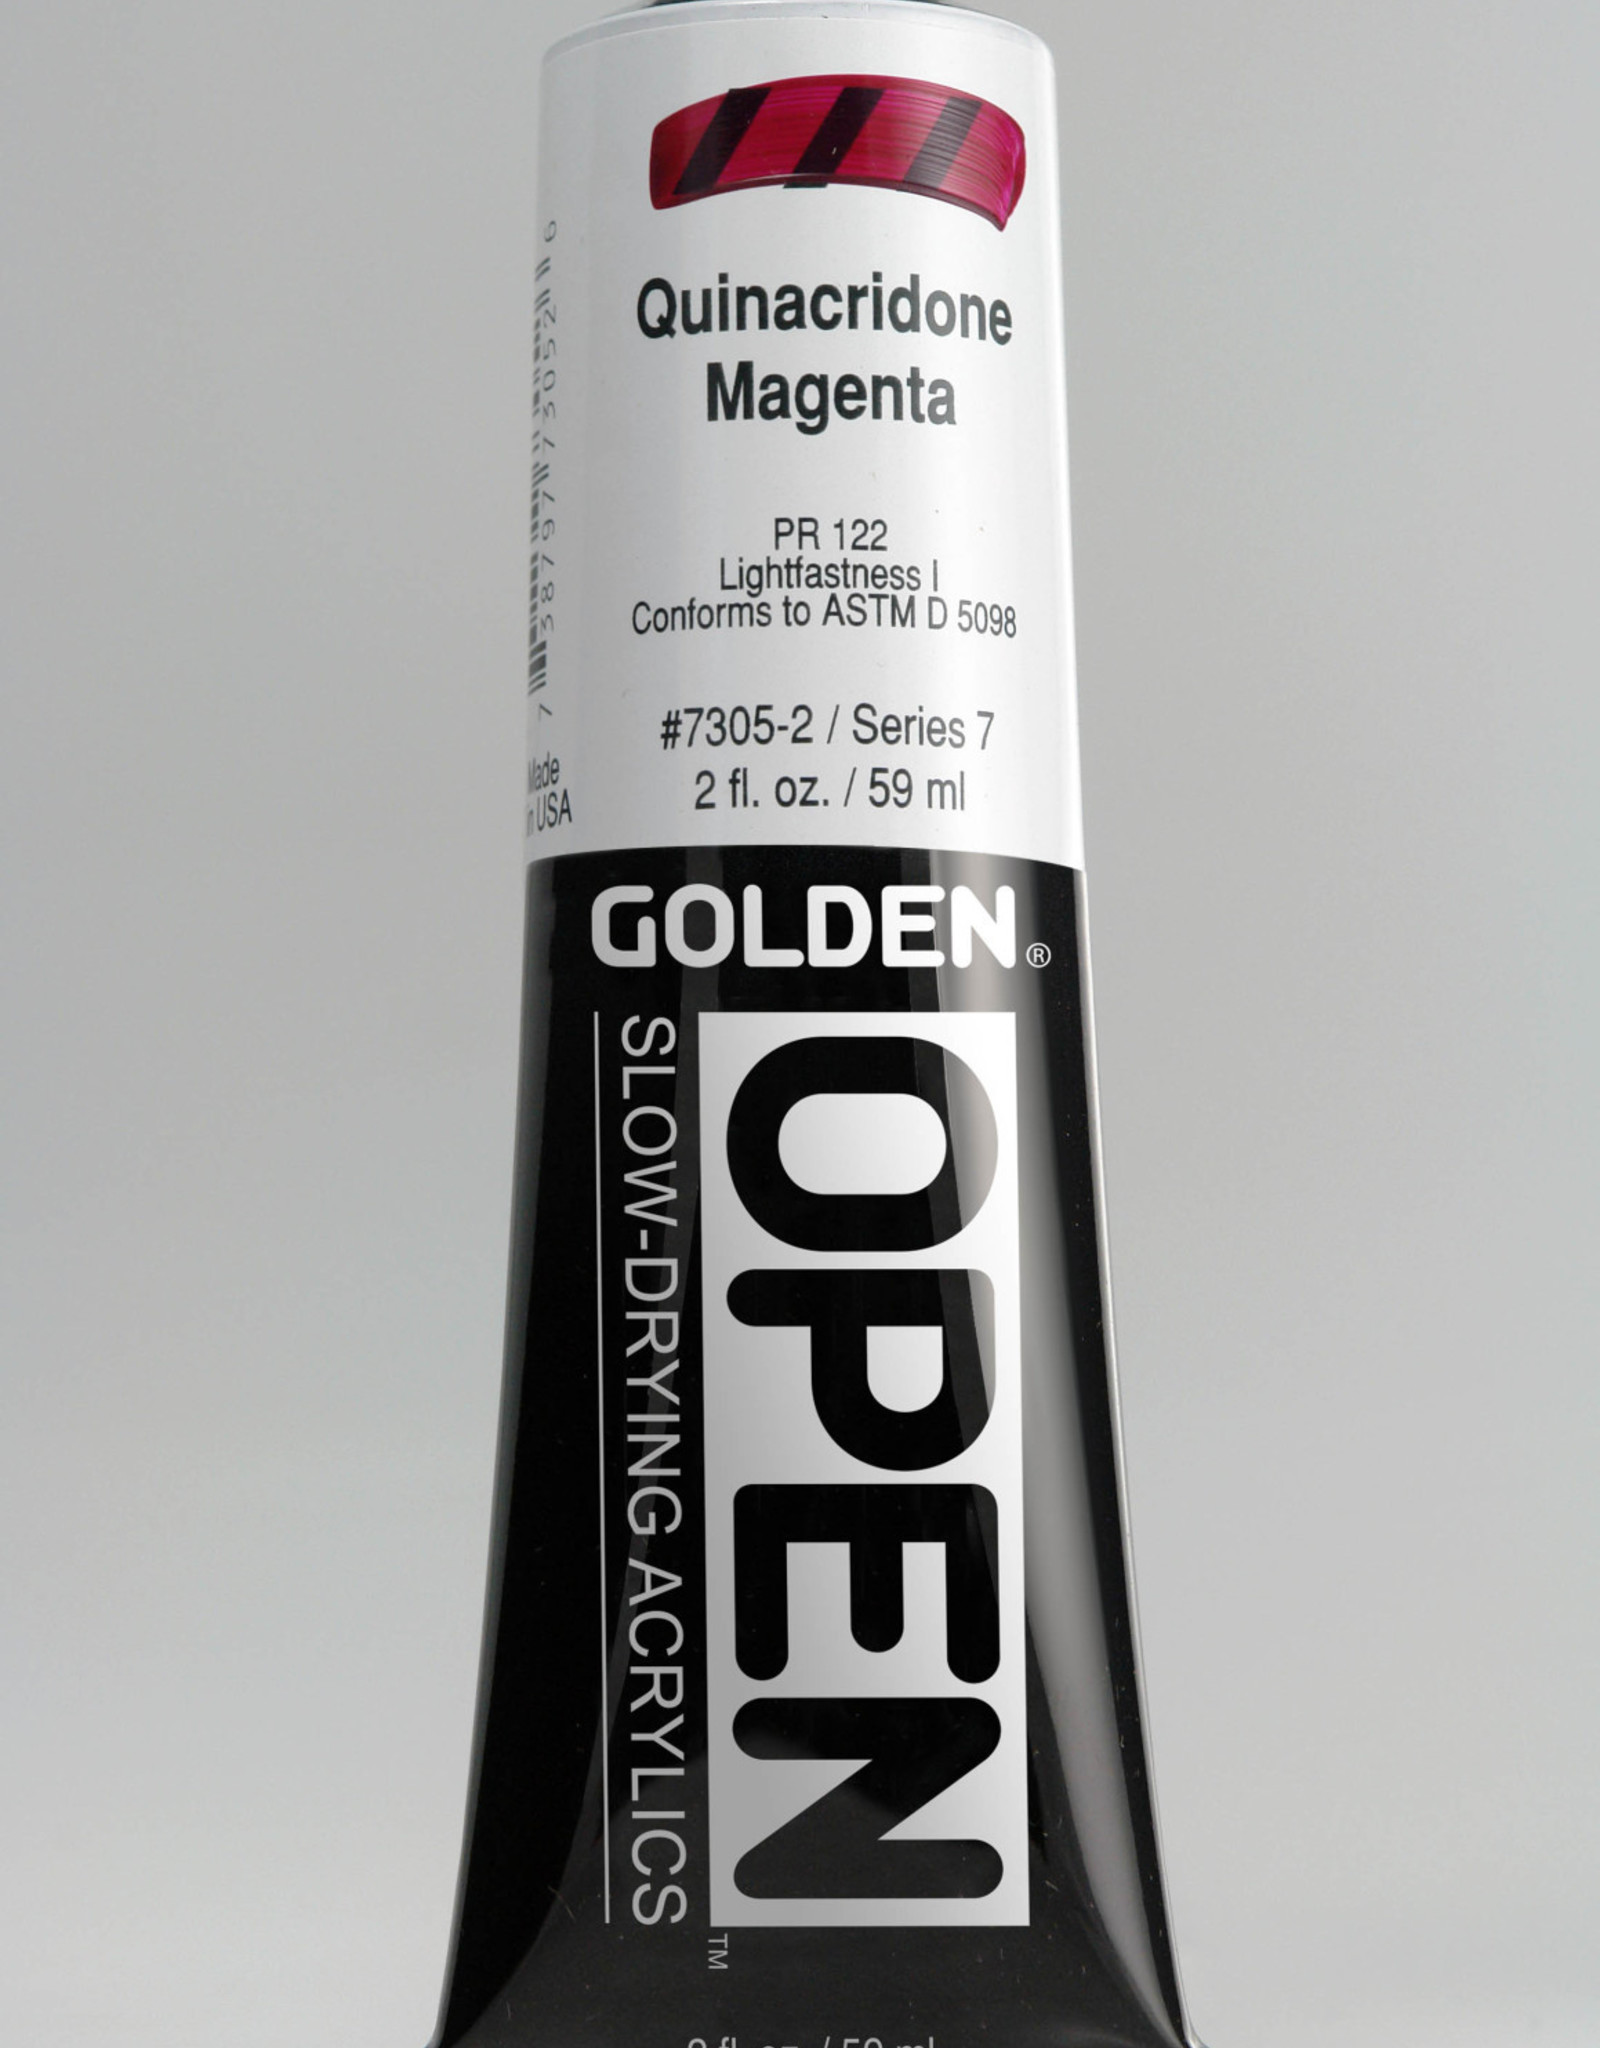 Golden OPEN, Acrylic Paint, Quinacridone Magenta, Series 7, Tube (2fl.oz.)